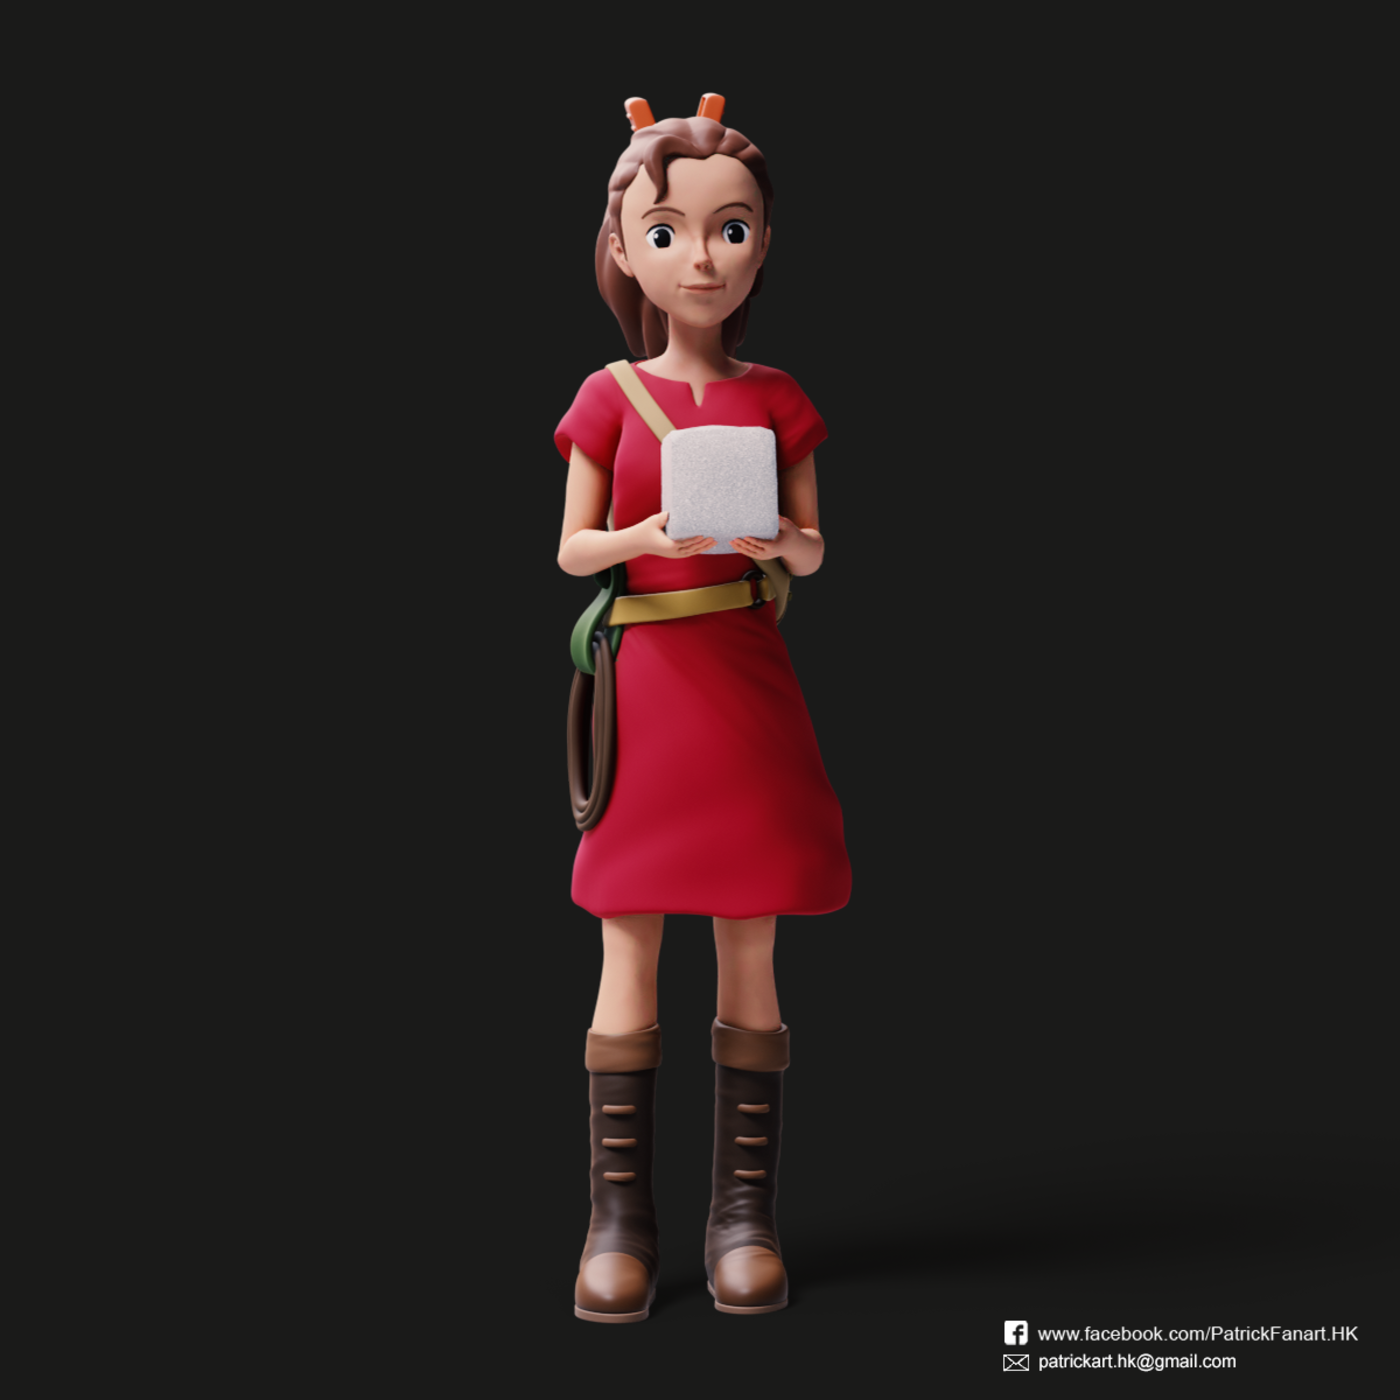 Arrietty(The Secret World of Arrietty)